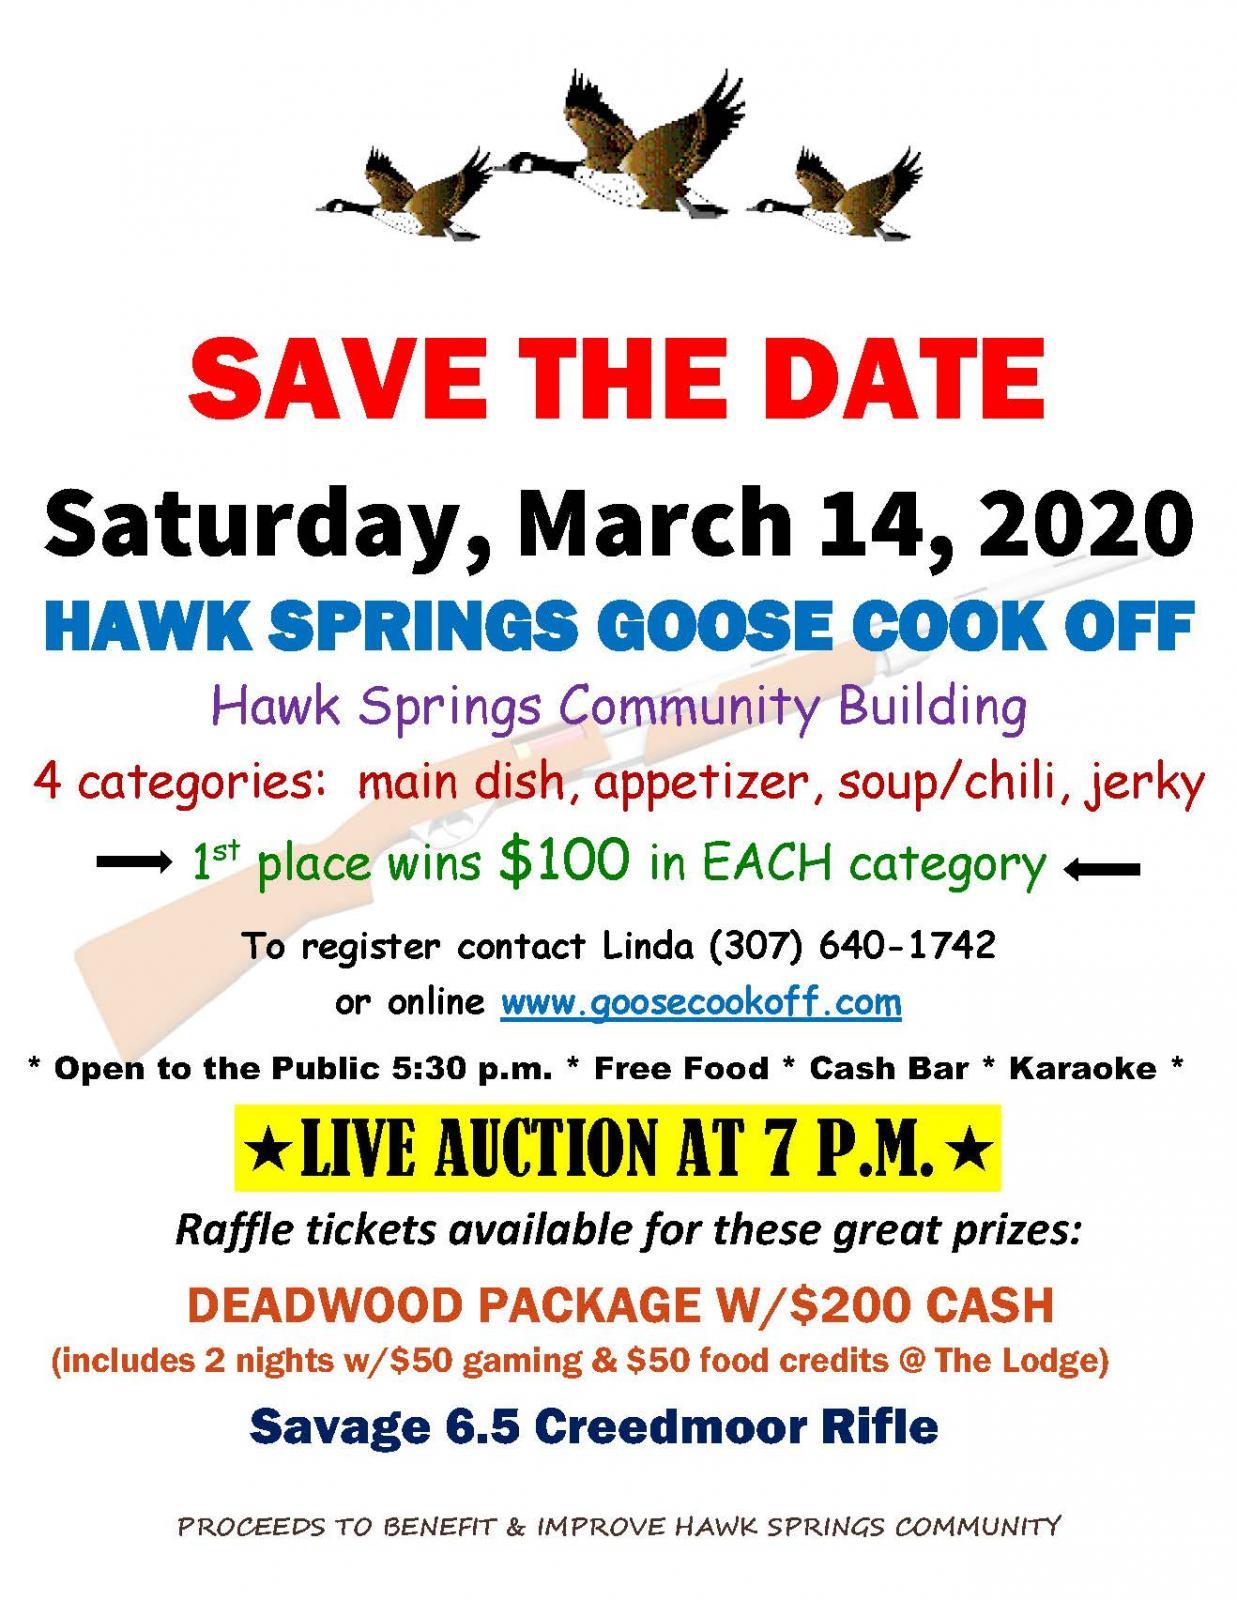 Hawk Springs Goose Cook Off Photo